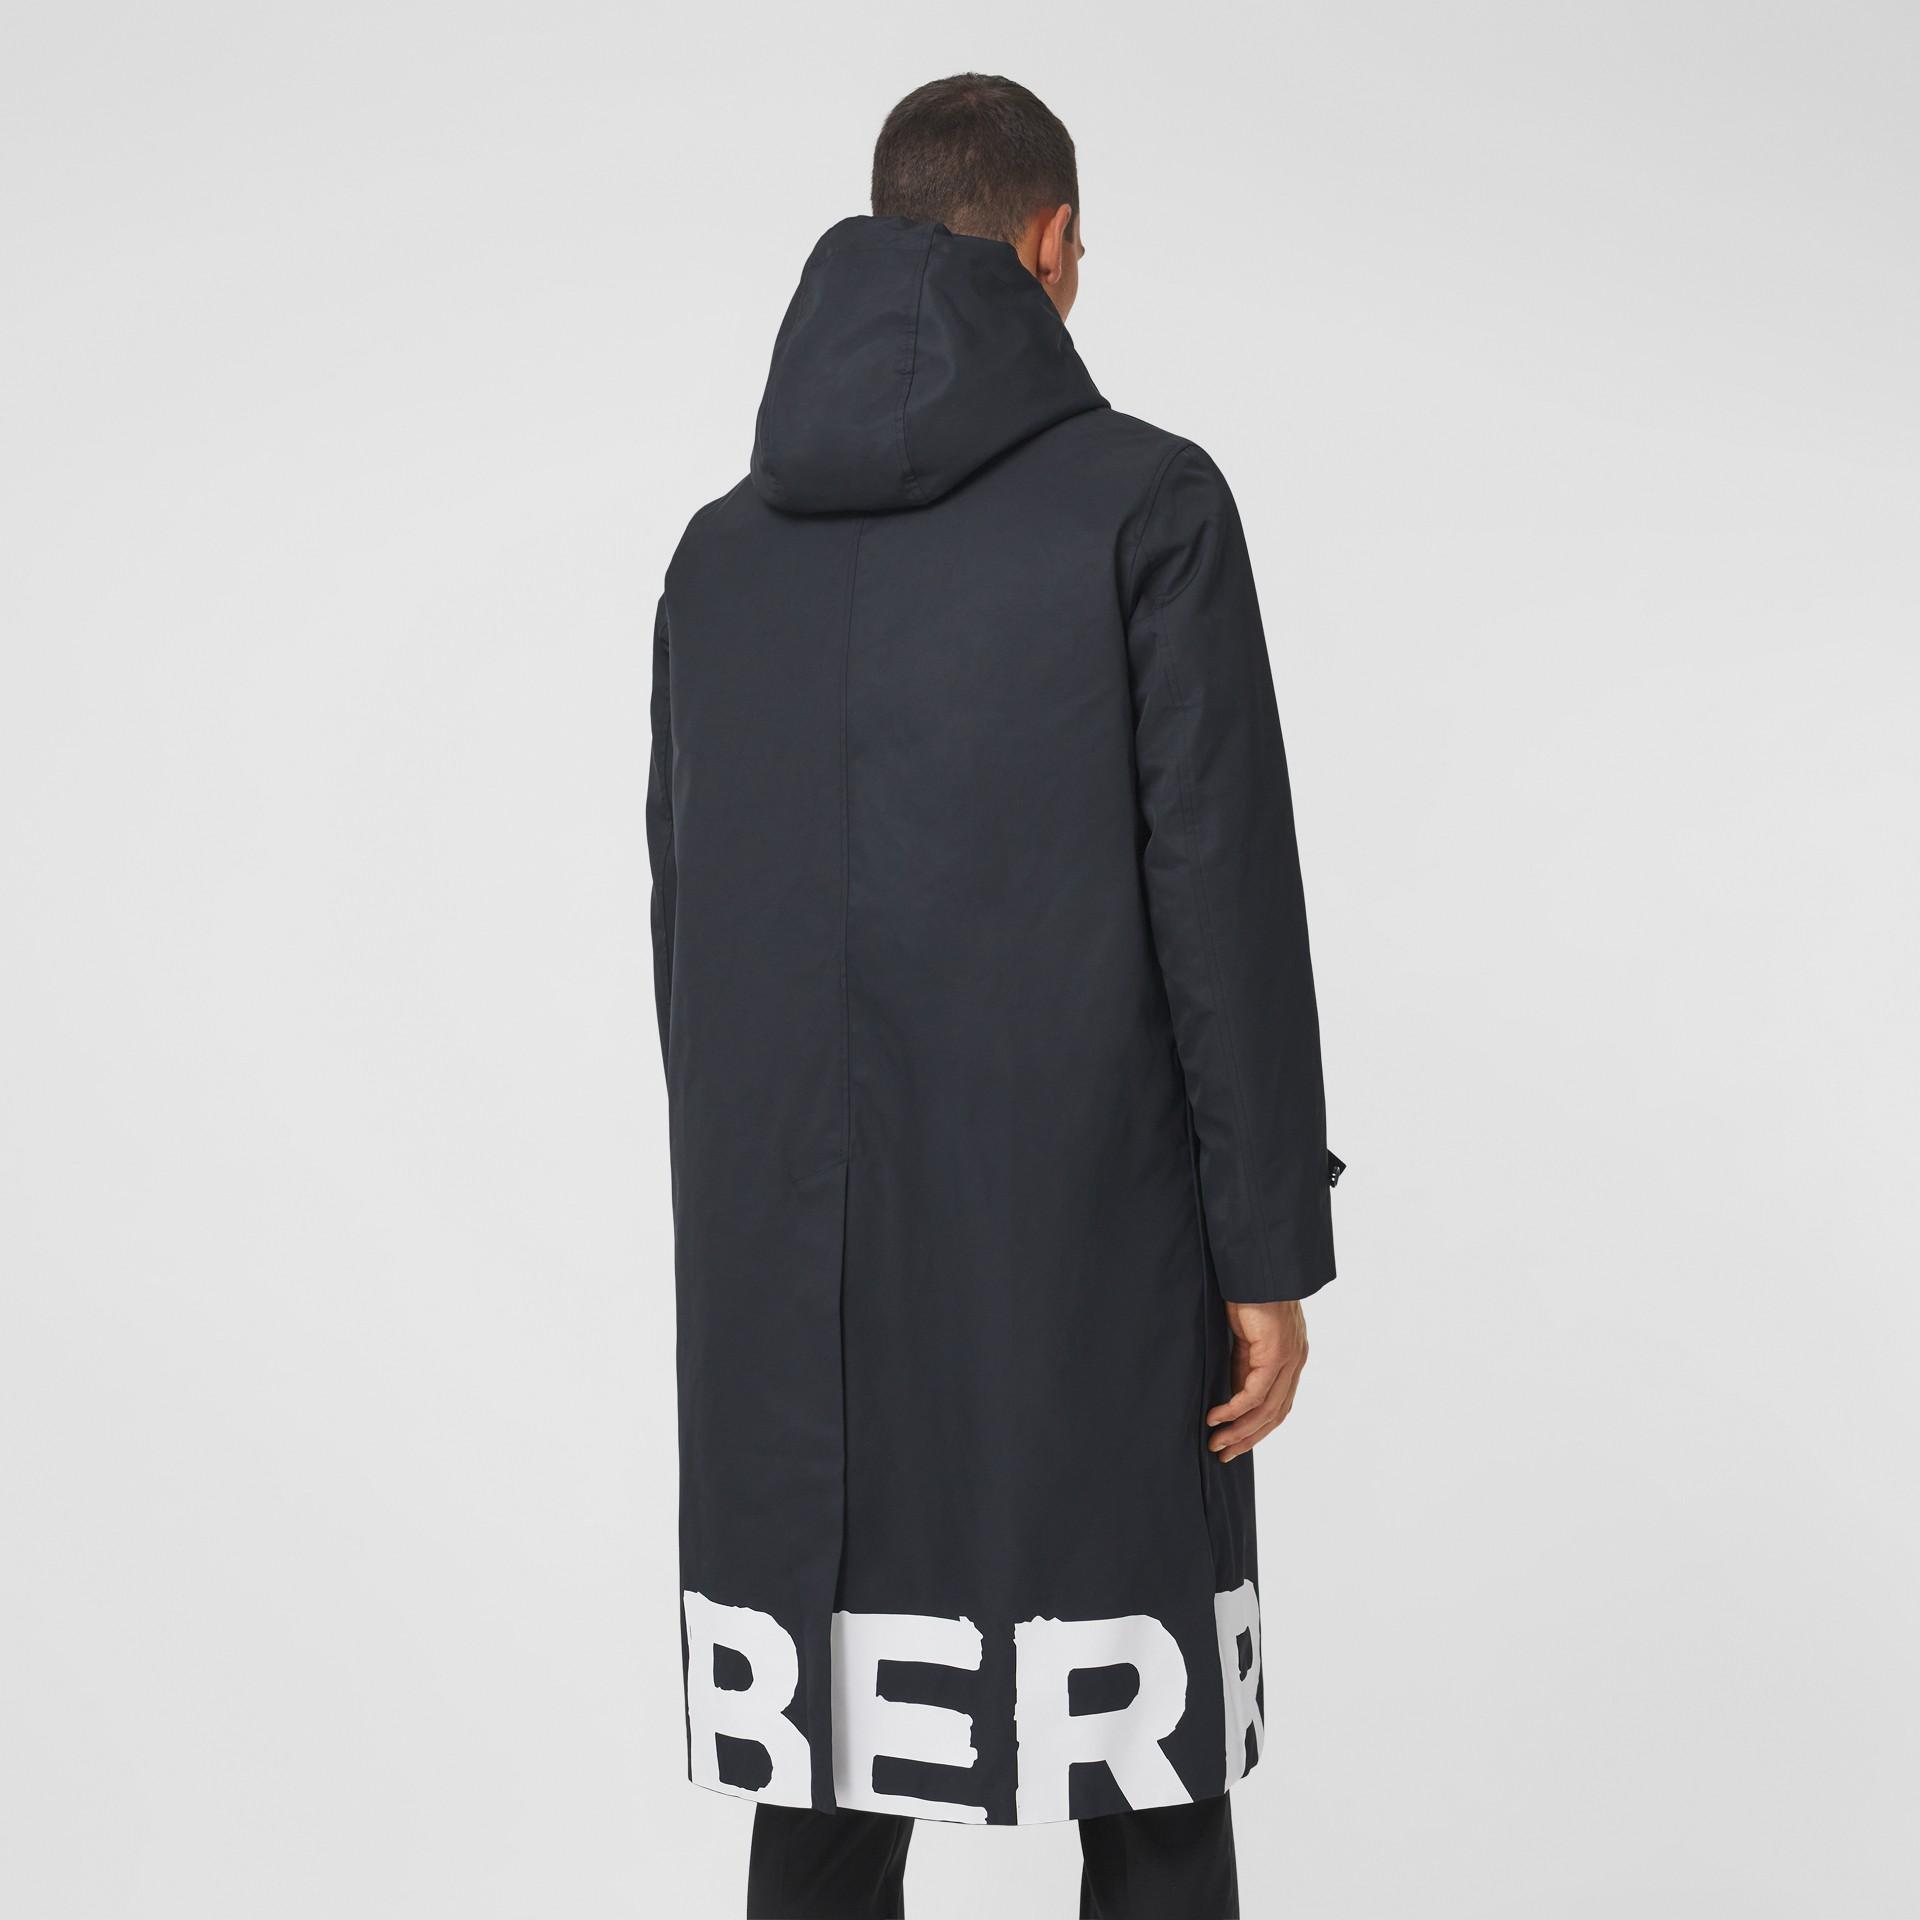 Logo Print Nylon Car Coat in Black - Men | Burberry - gallery image 2